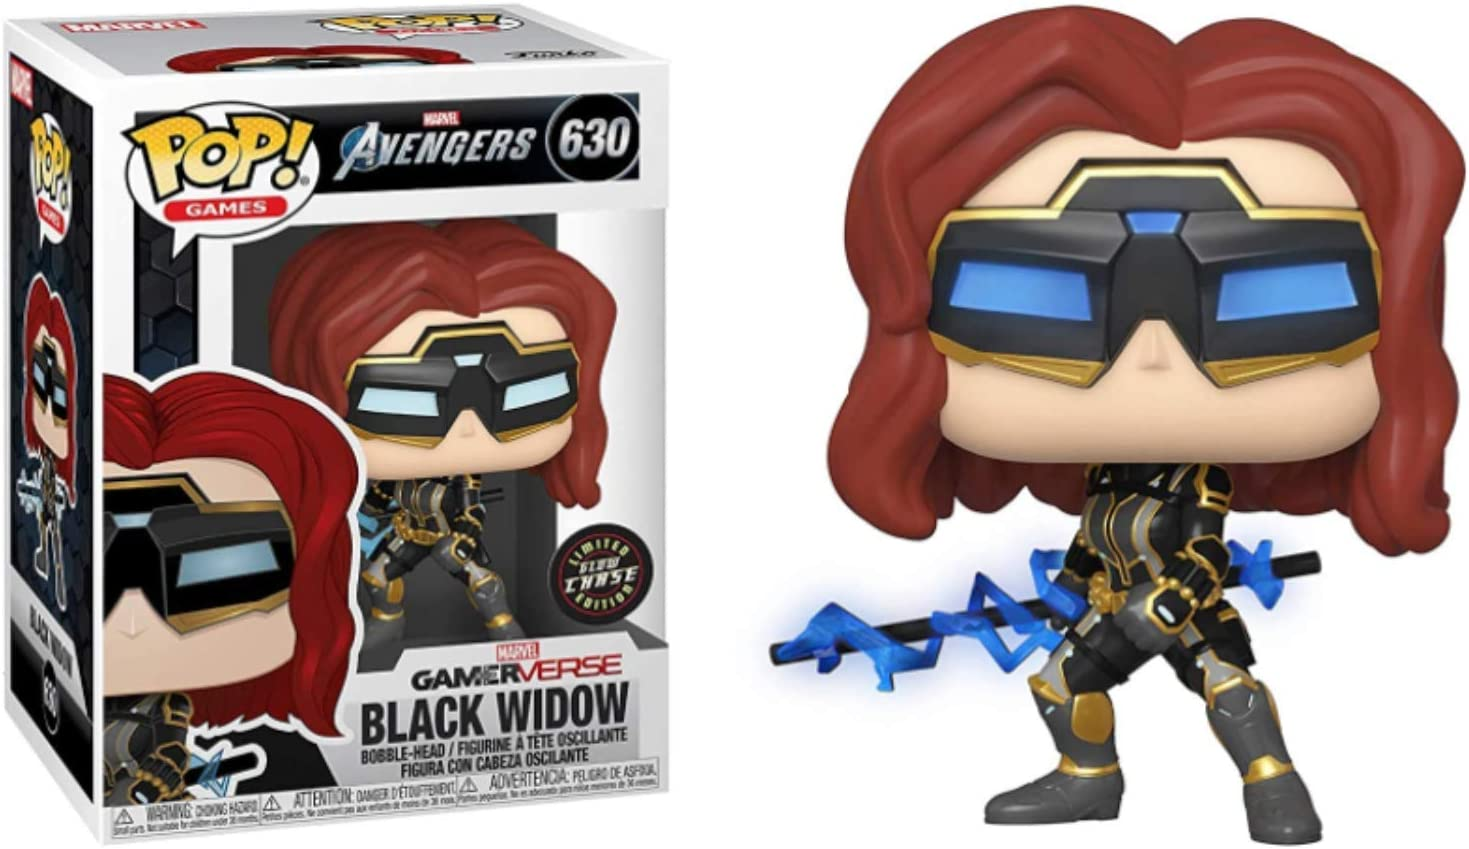 Funko POP Games New New product! New type York Mall Black Widow 3.75